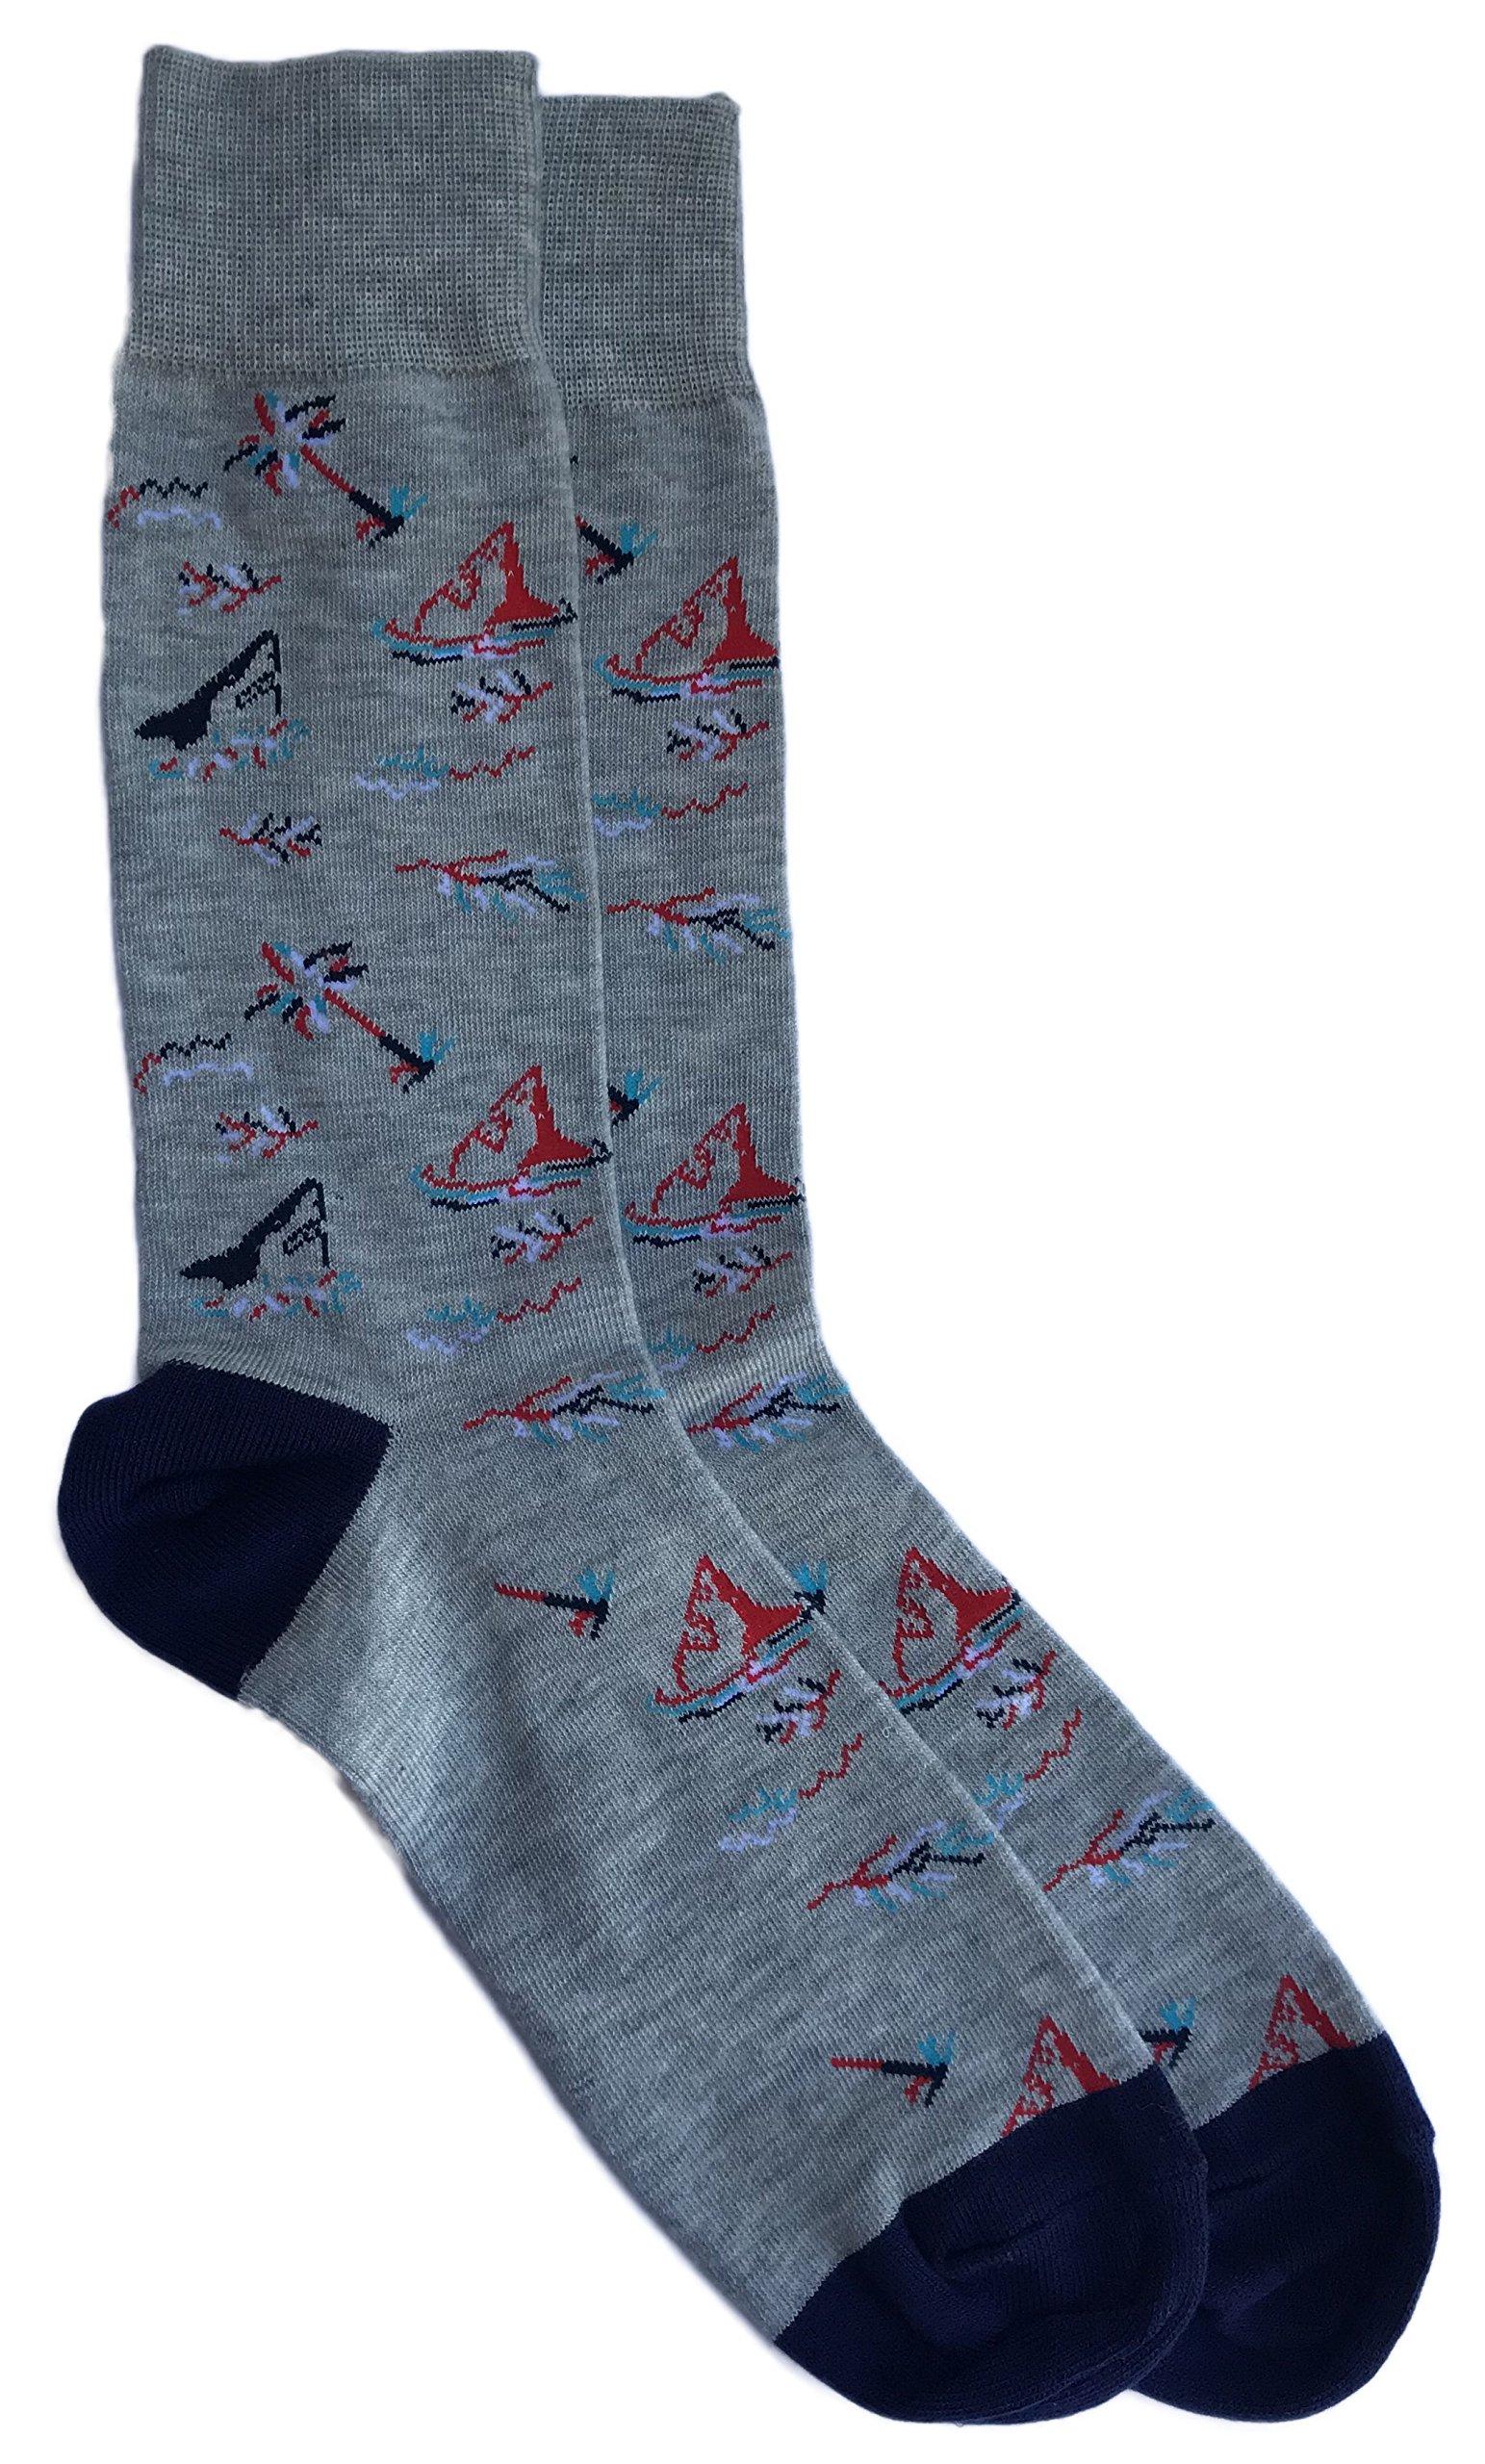 Unionbay Shark Themed Men's Novelty Fashion Crew Sock